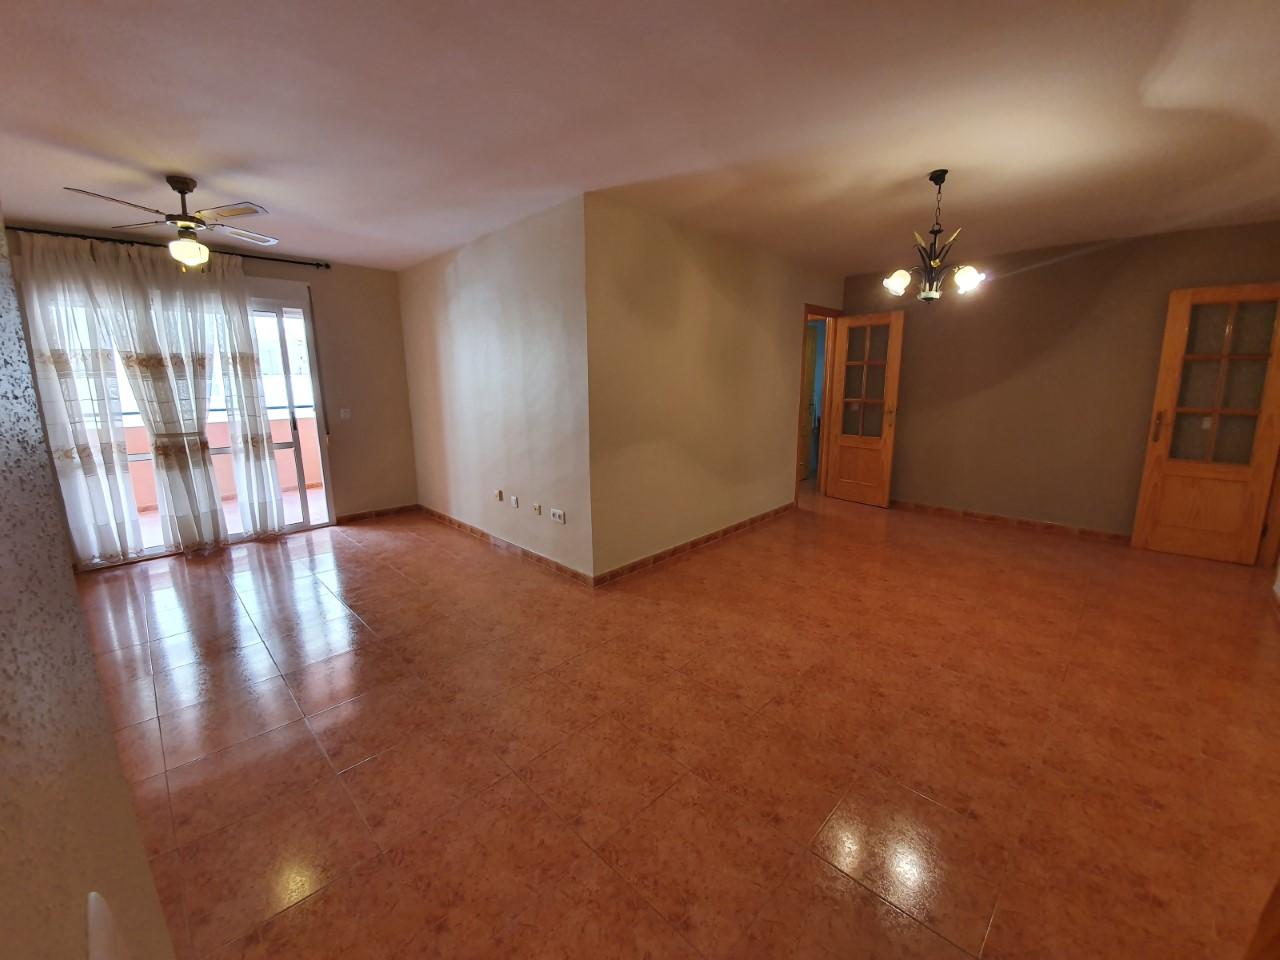 mp1157-Four bedroom apartment in Garrucha.